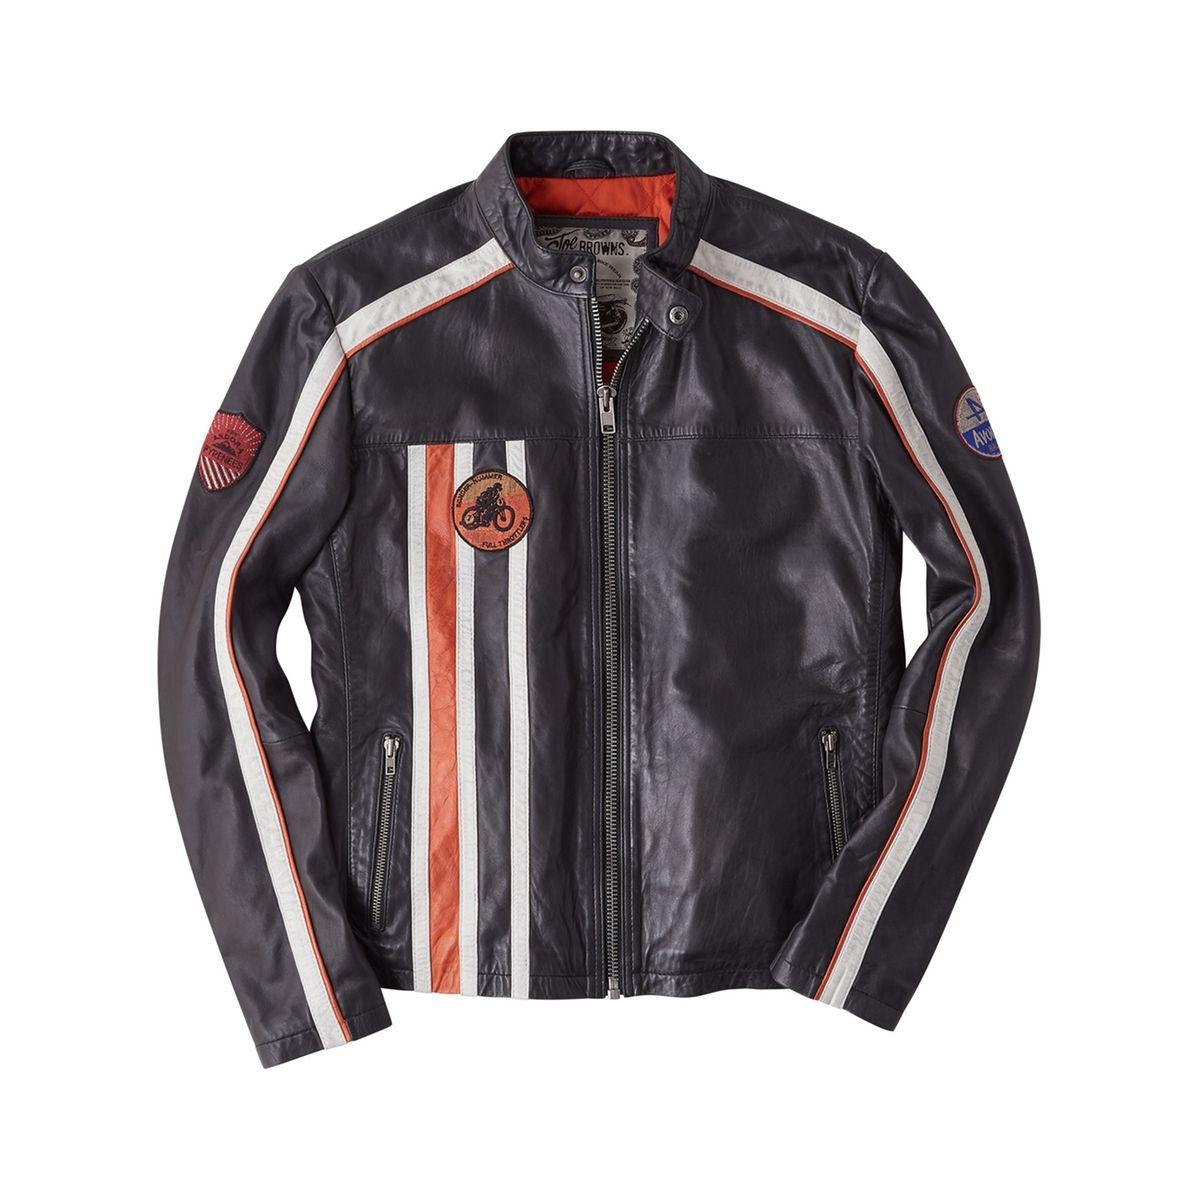 Browns Rétro Veste Cuir Homme Noir Moto Joe Véritable Brown Orange BCdoexr